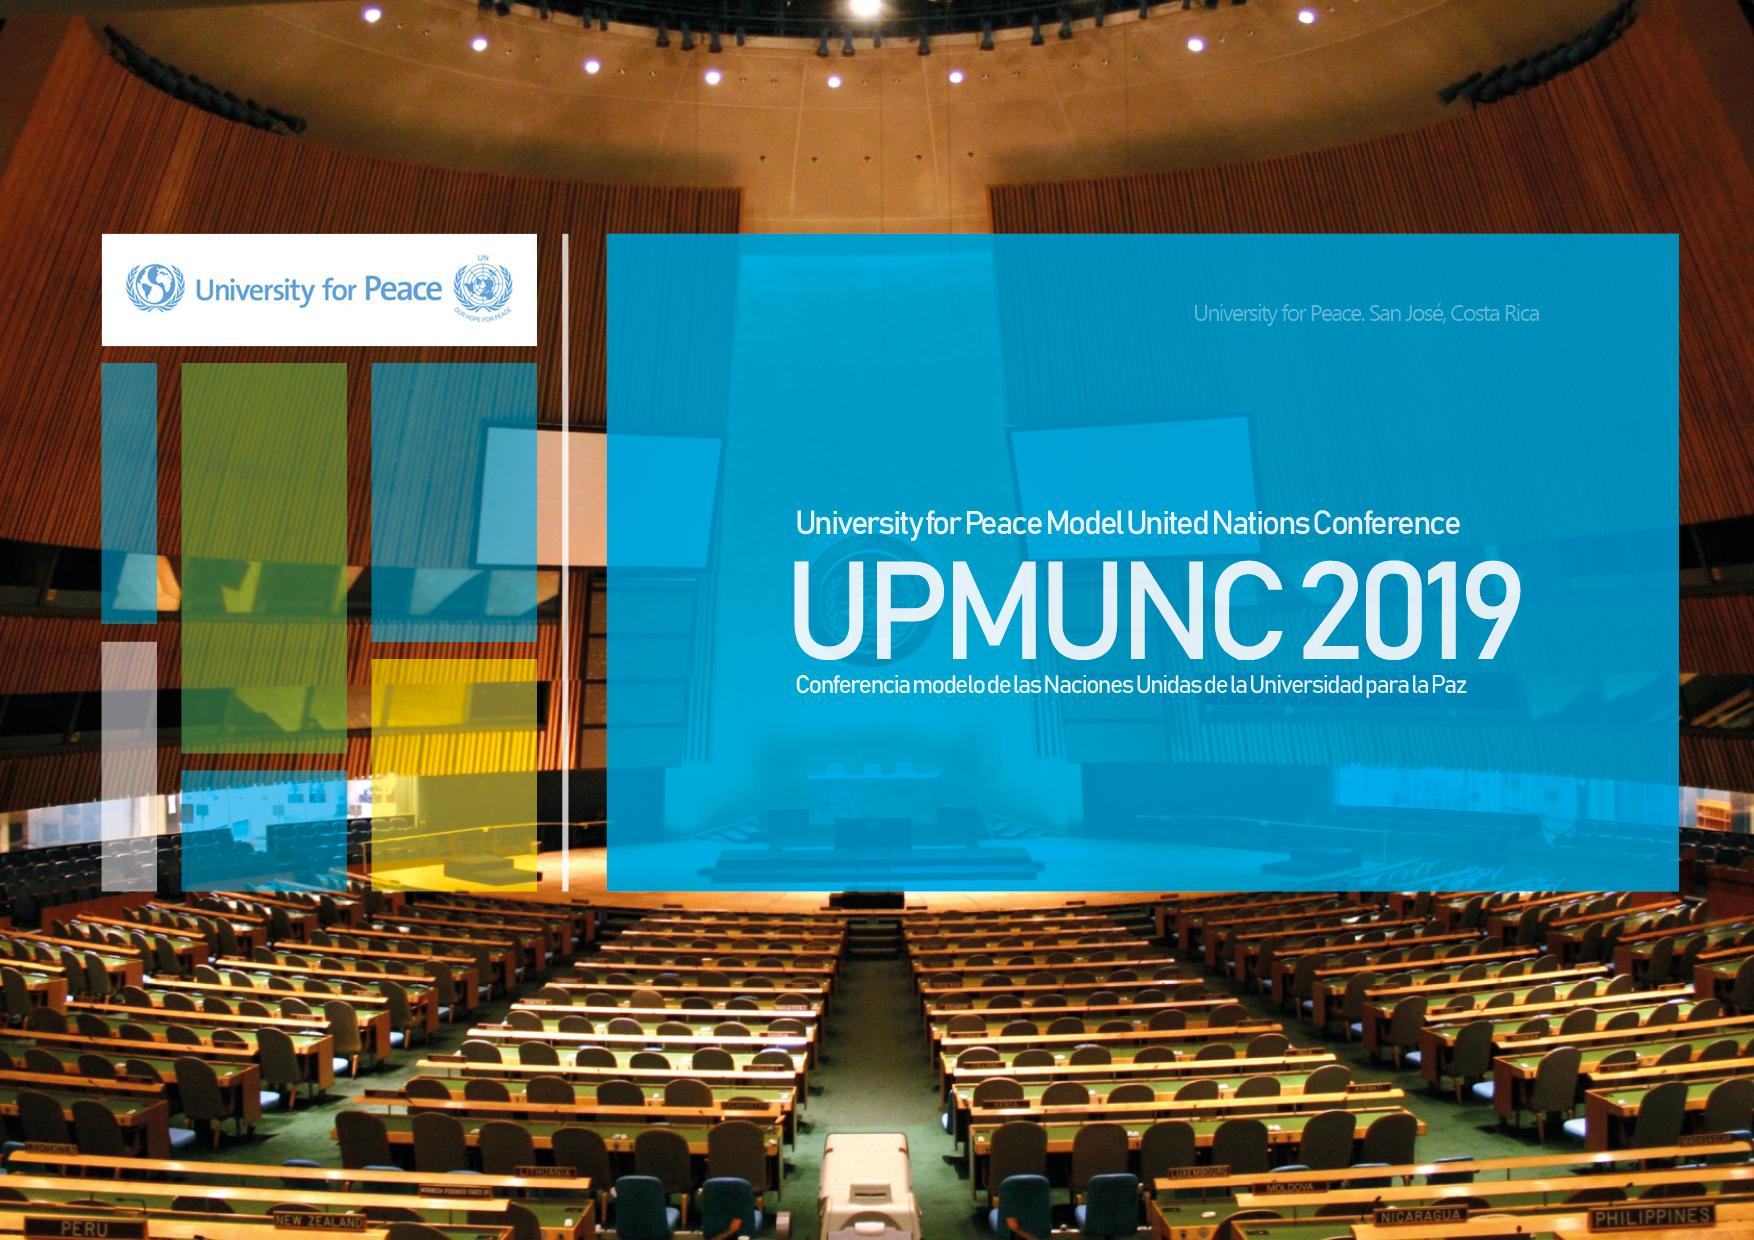 UPMUNC 2019 Poster